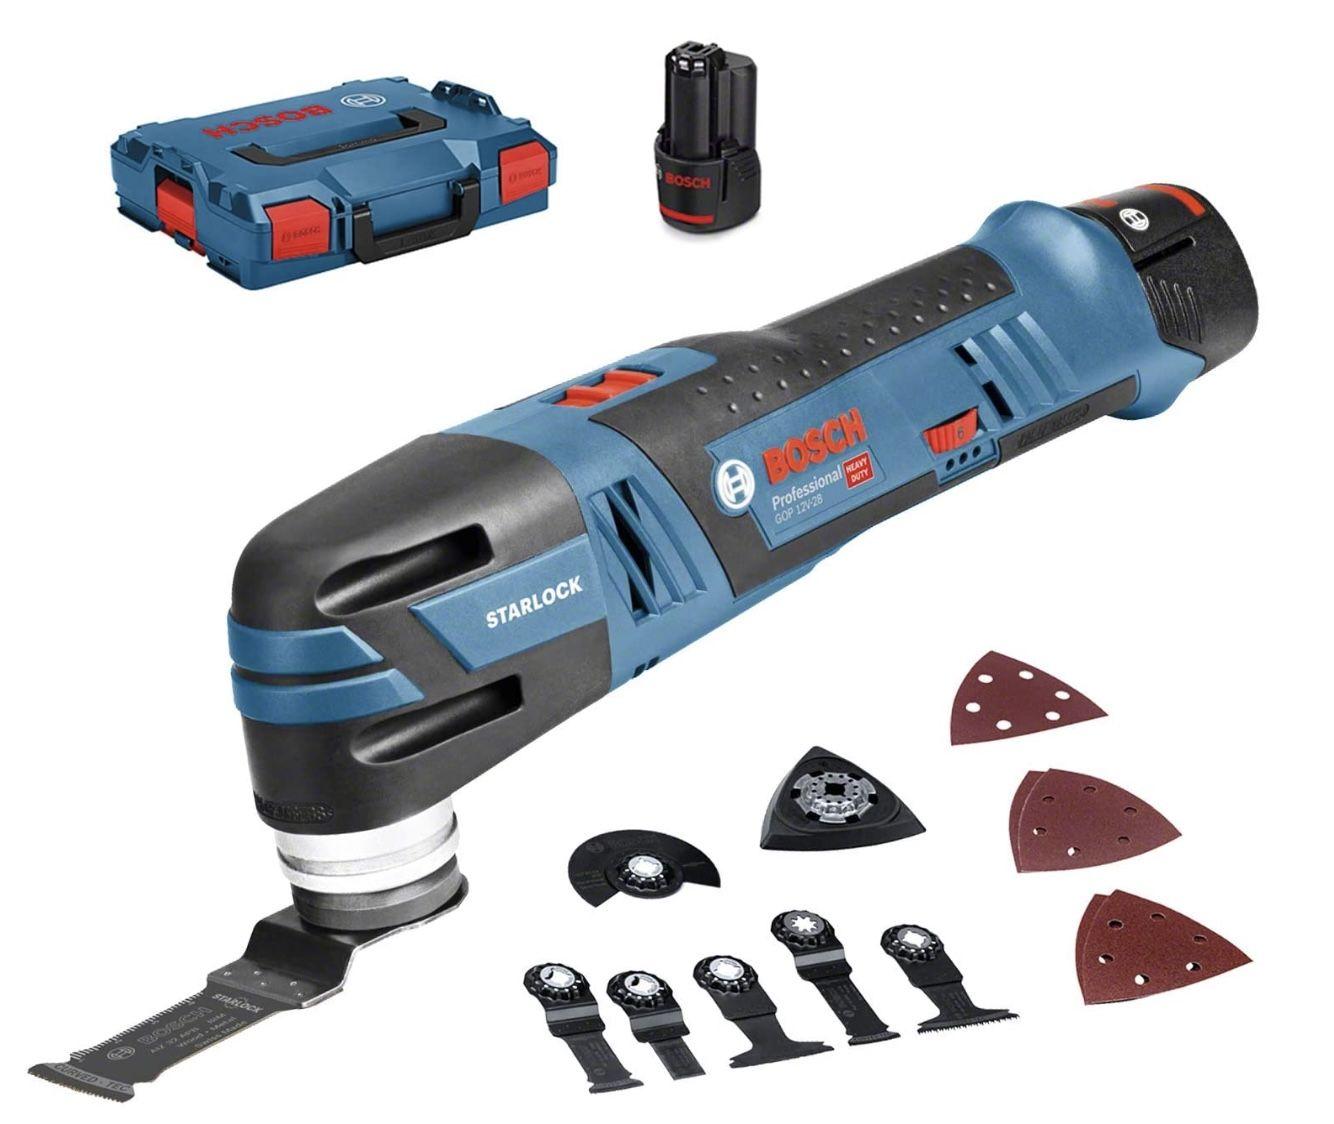 Bosch Professional GOP 12V-28 Akku Multi-Cutter inkl. 3,0x Ah Akku, L-BOXX 136 + Schnellladegerät für 181,80€ (statt 224€)